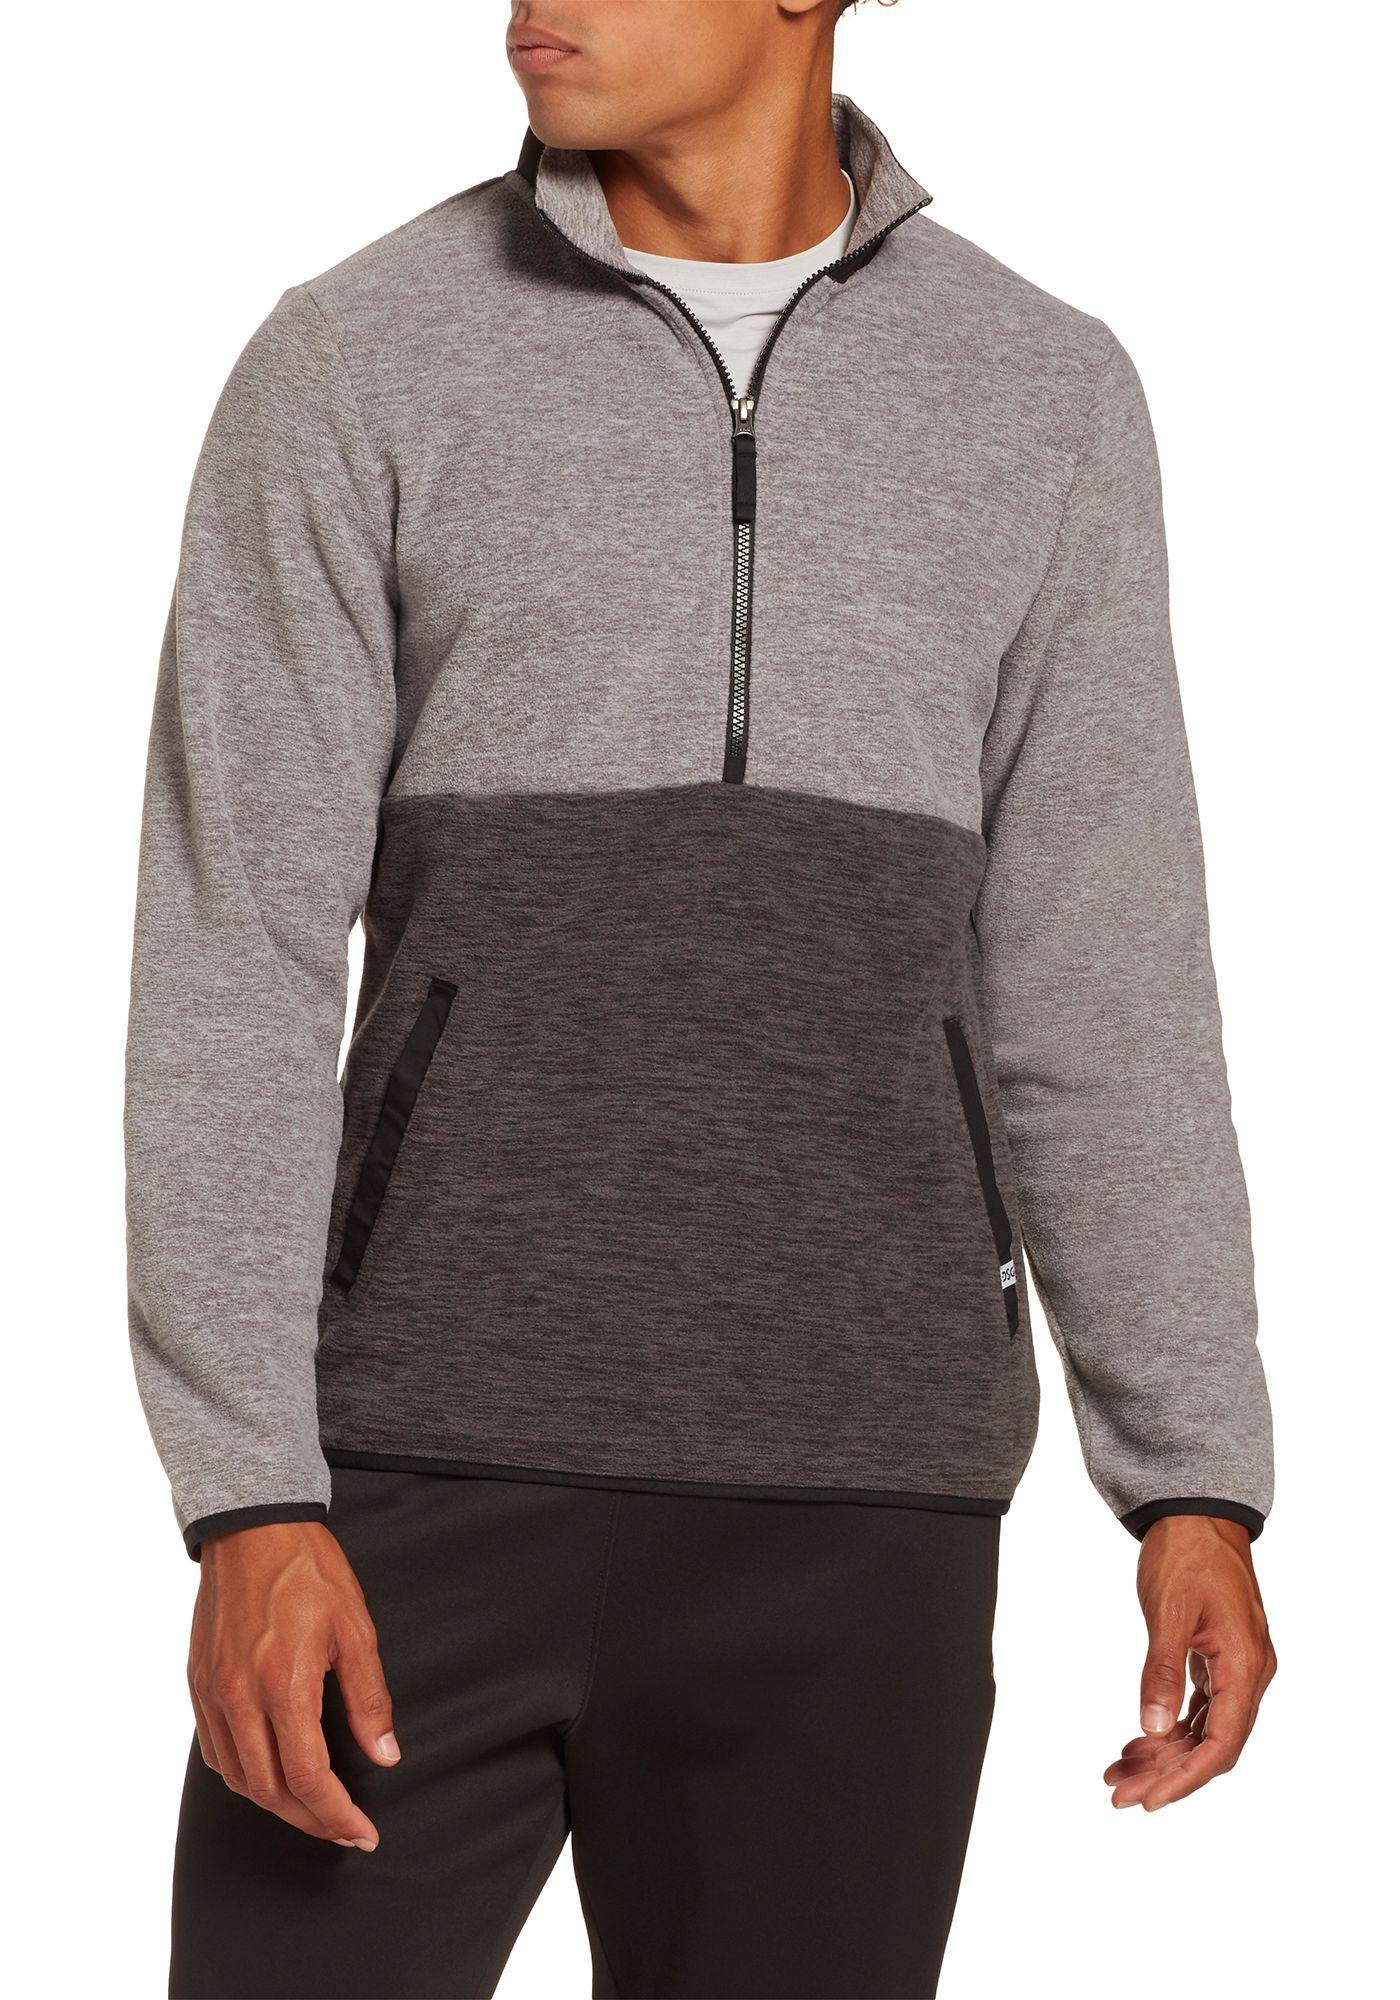 DSG Men's Everyday Heather Polar Fleece 1/2 Zip Pullover